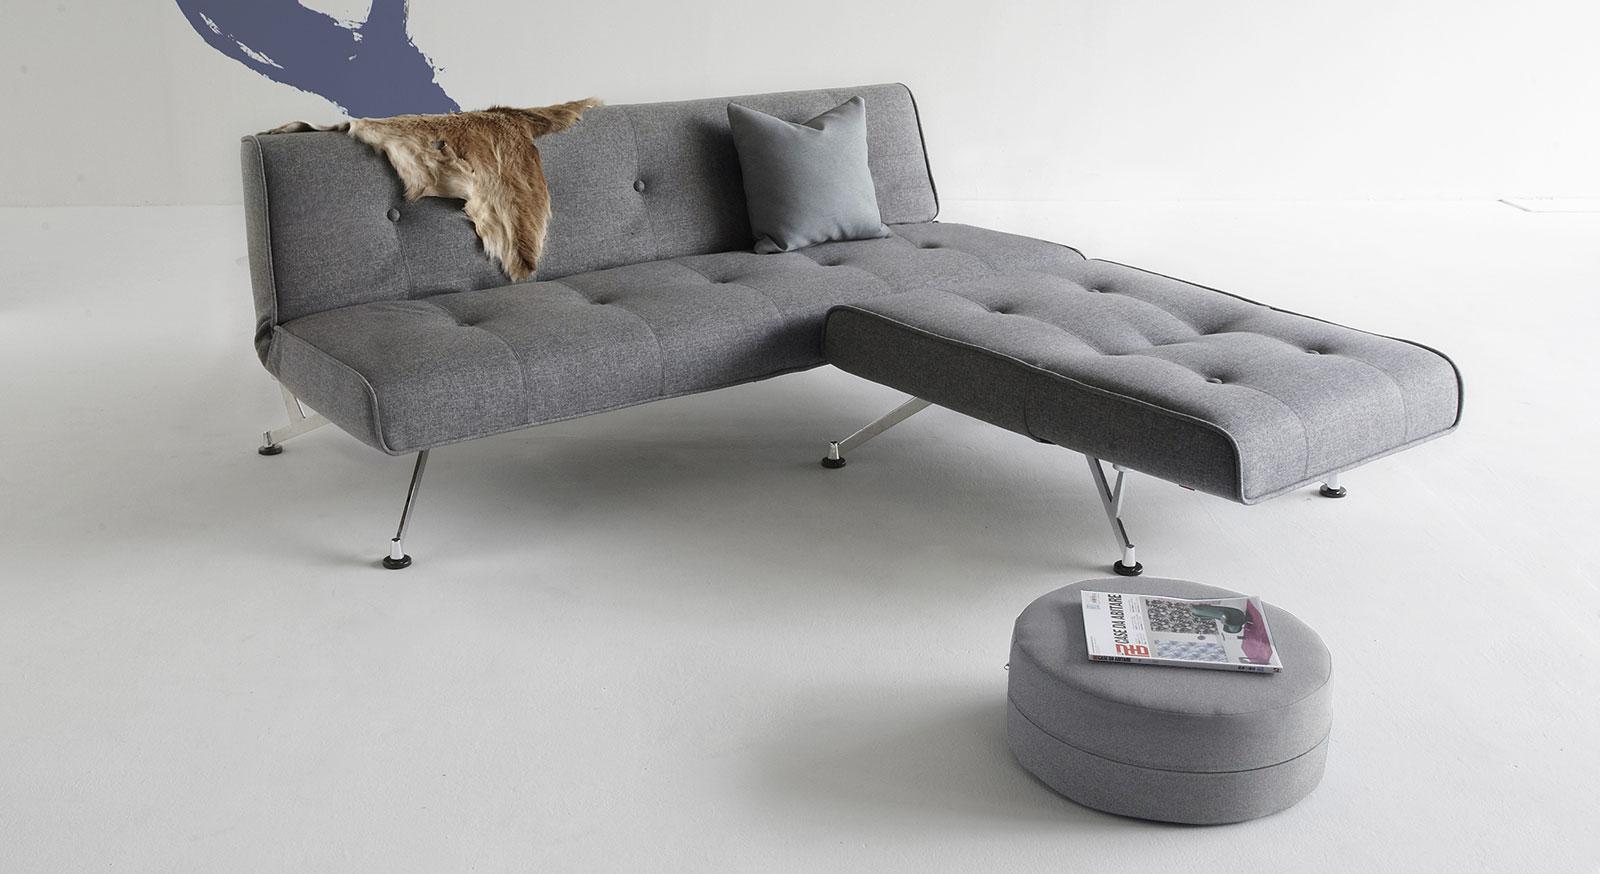 Sessel Norton mit passenden Produkten